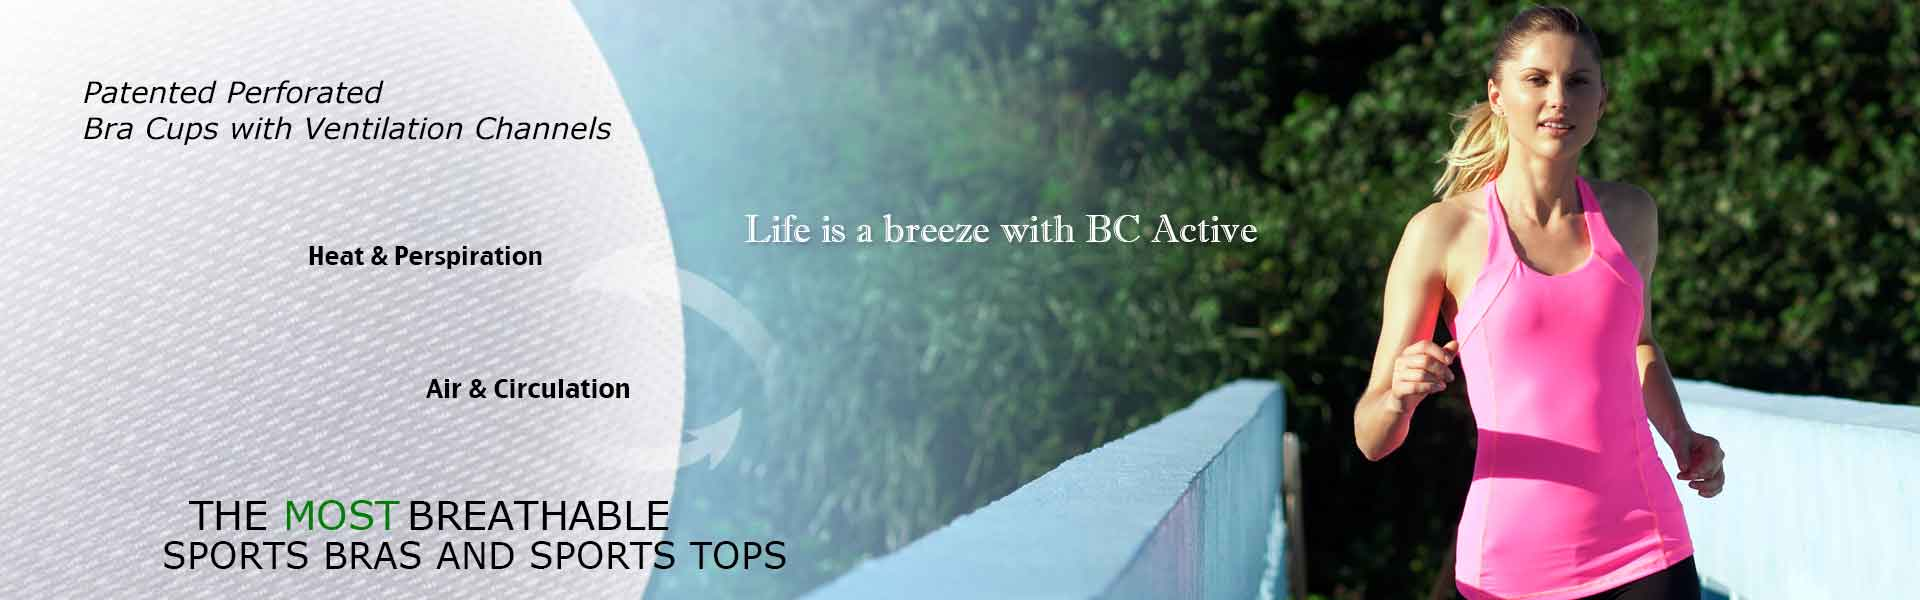 BC Active Wear